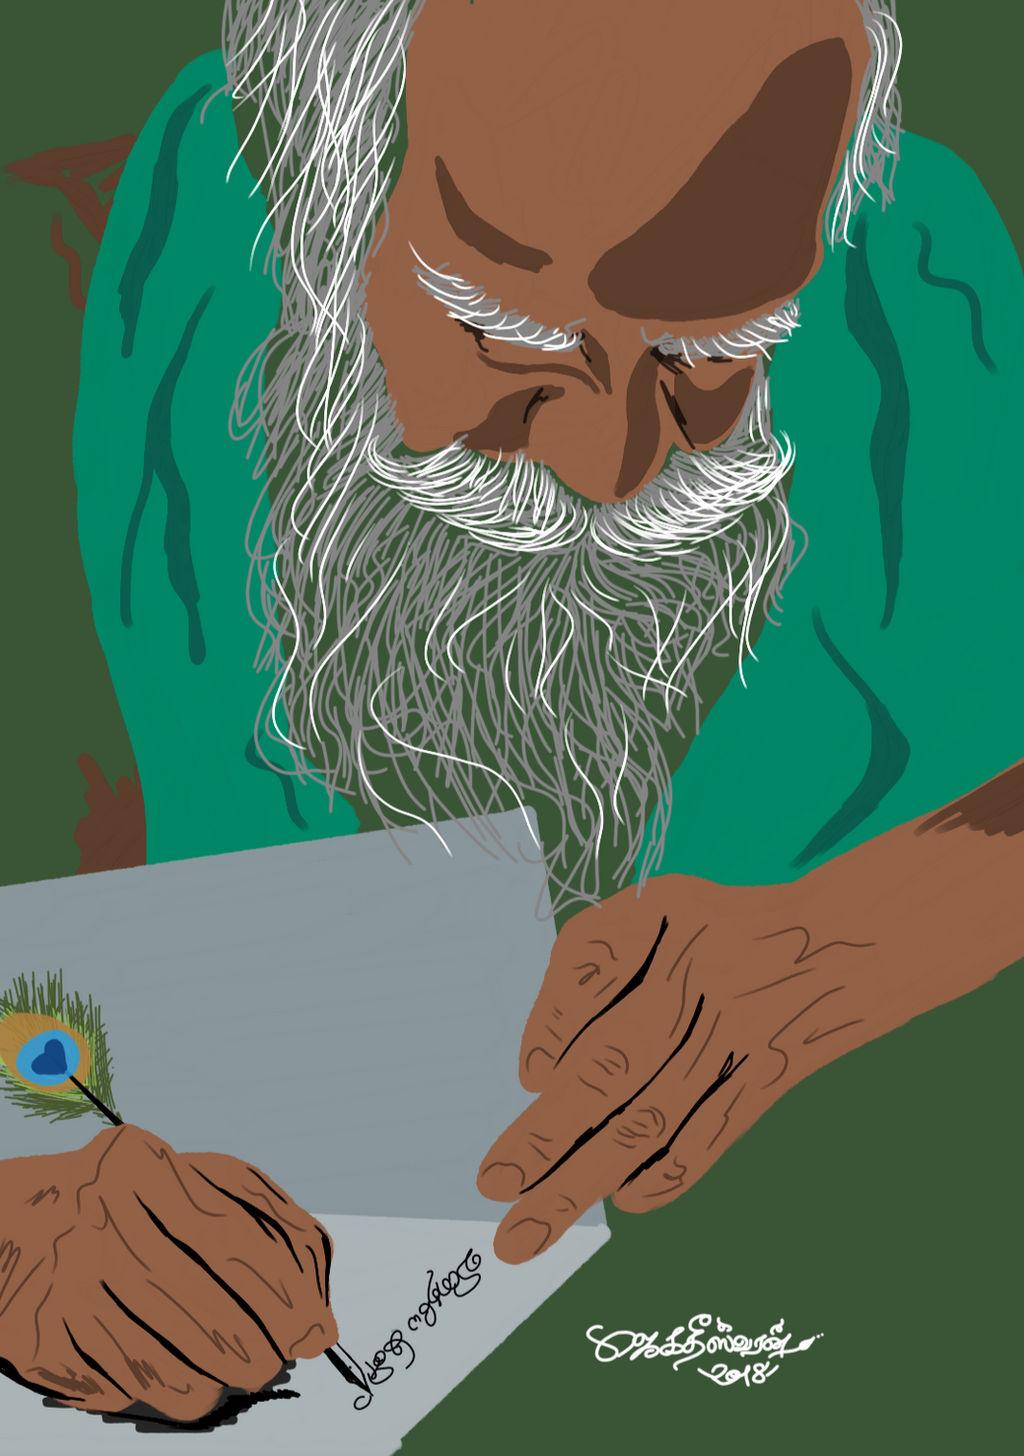 G. Nammalvar digital painting free download